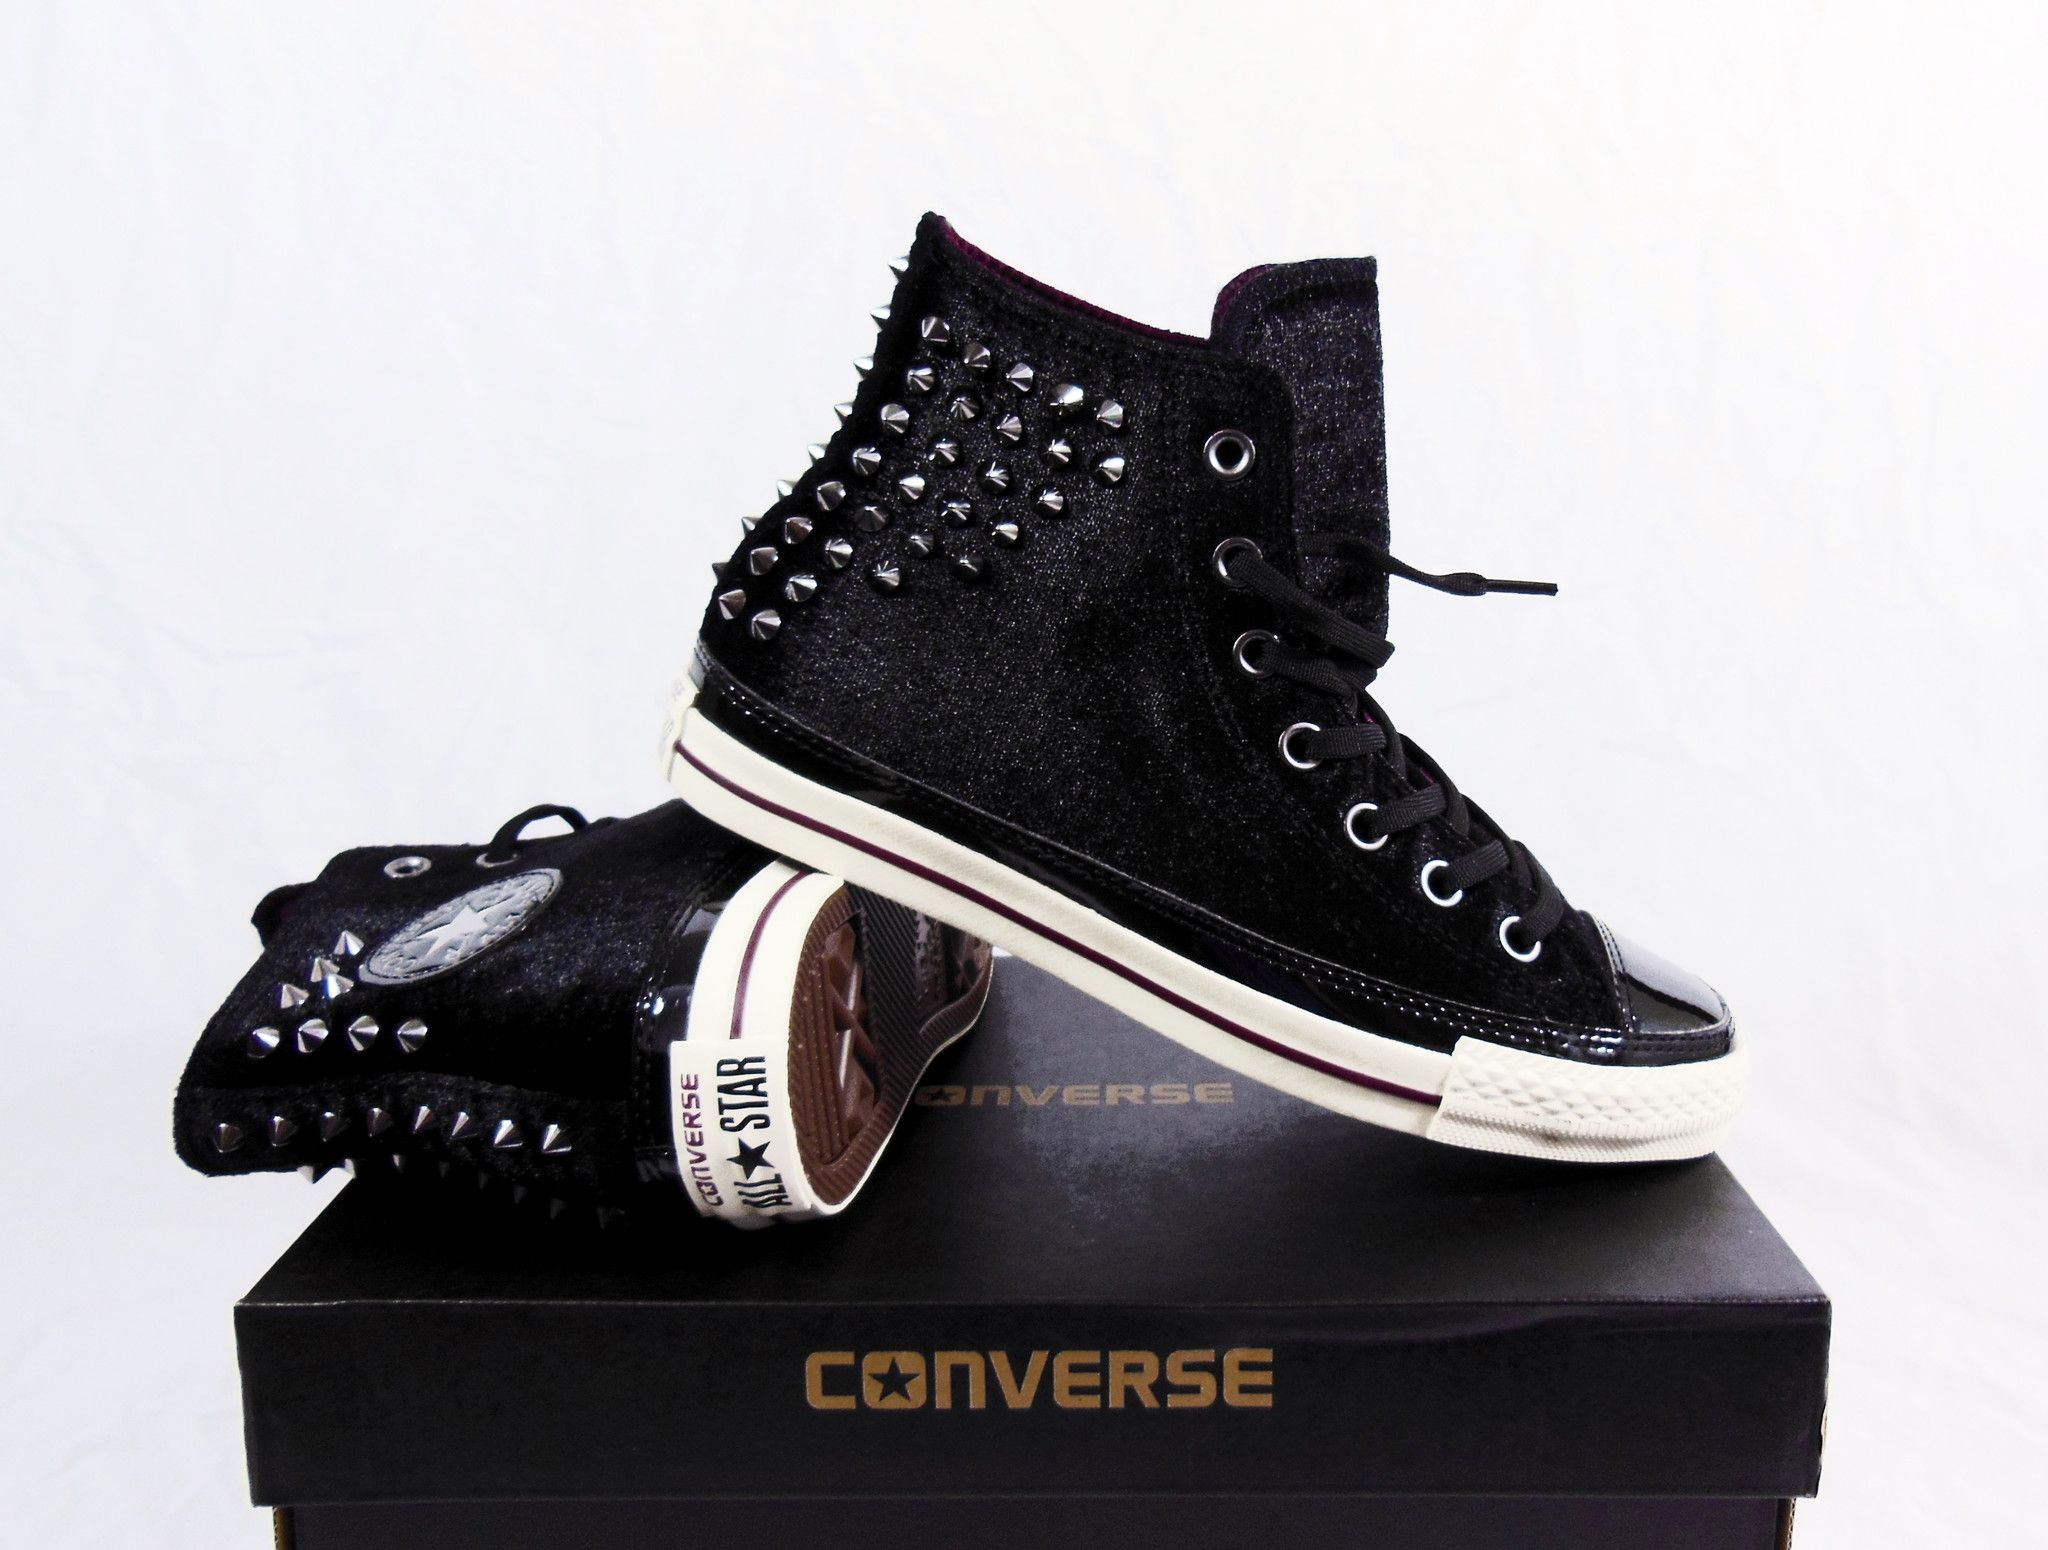 CT AS HI VELVET STUDS - FOOTWEAR - High-tops & sneakers Converse Hot Sale For Sale aQ9TAC